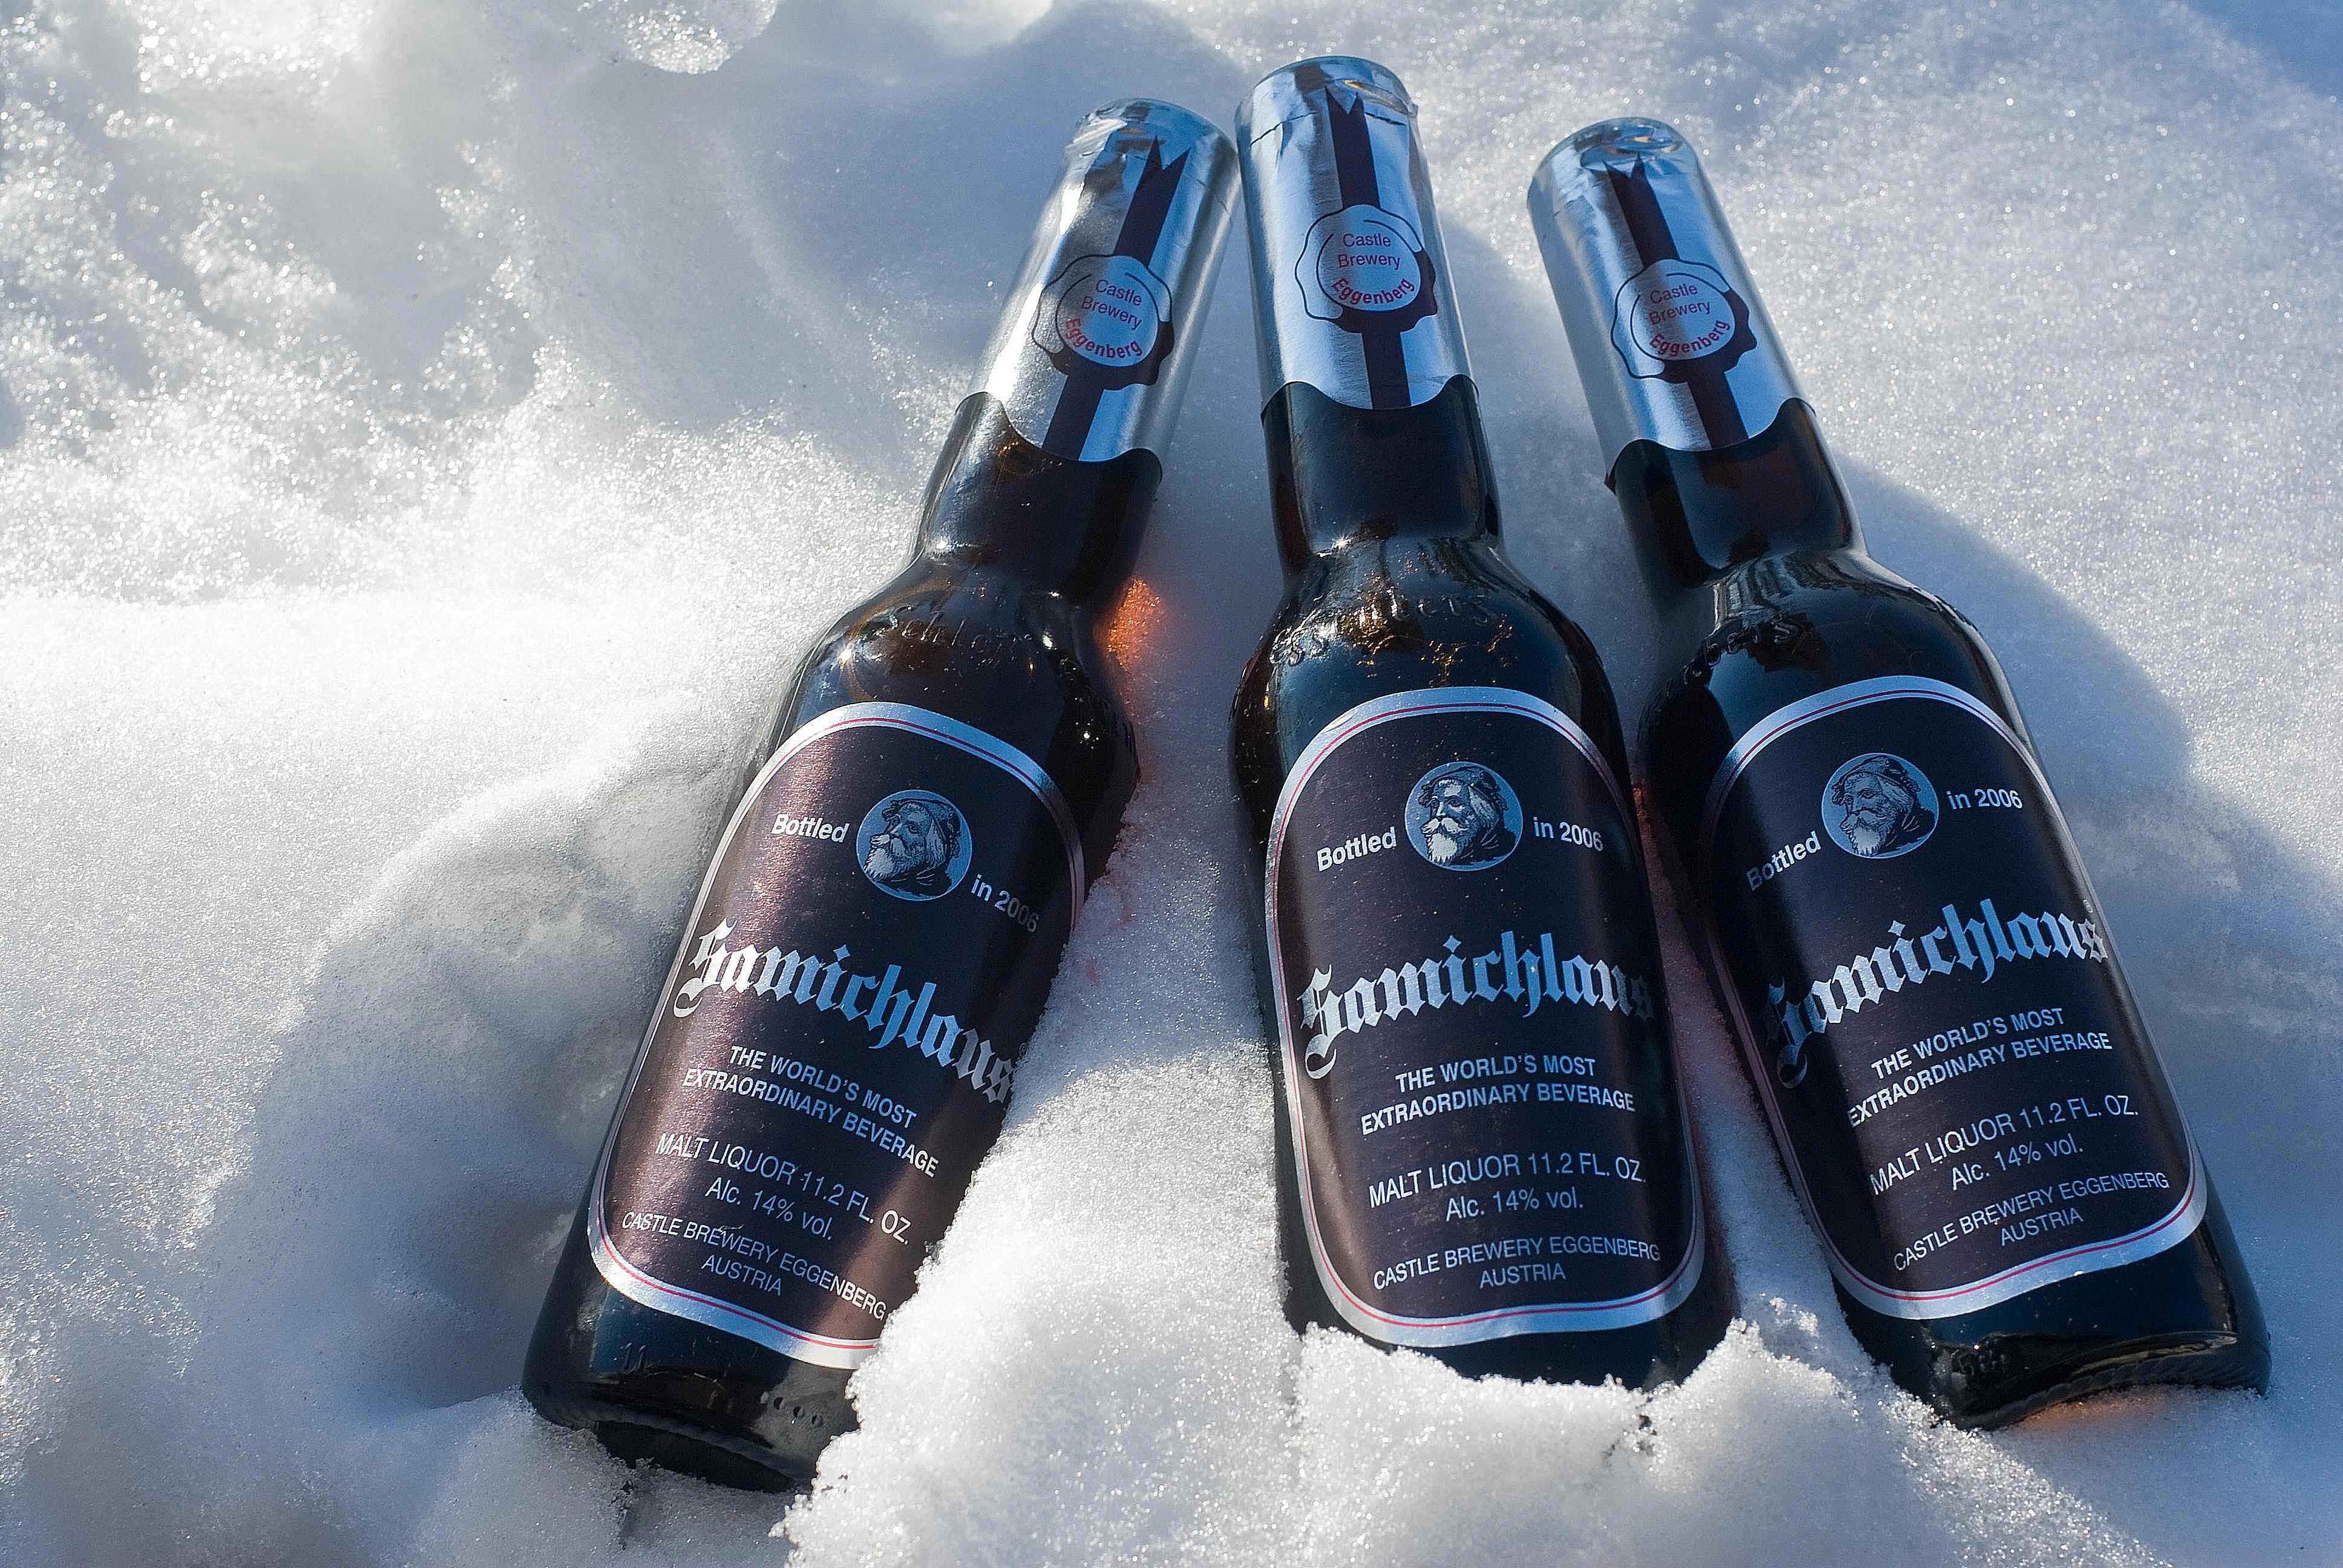 Beer Styles Scottish Ale vs Scotch Ale